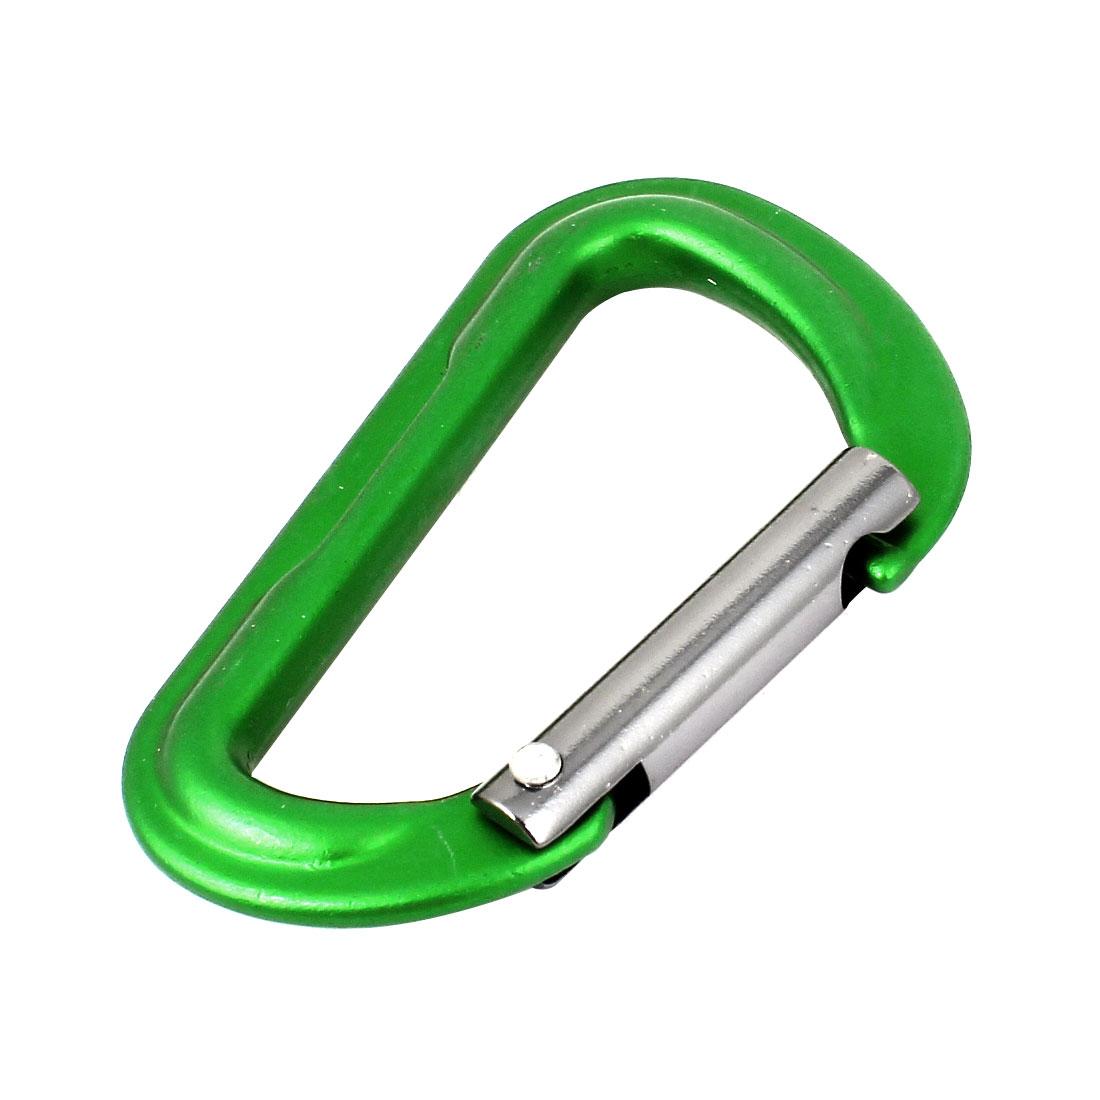 Camping Spring Loaded Aluminum Alloy Carabiner Clip Snap Hook Green